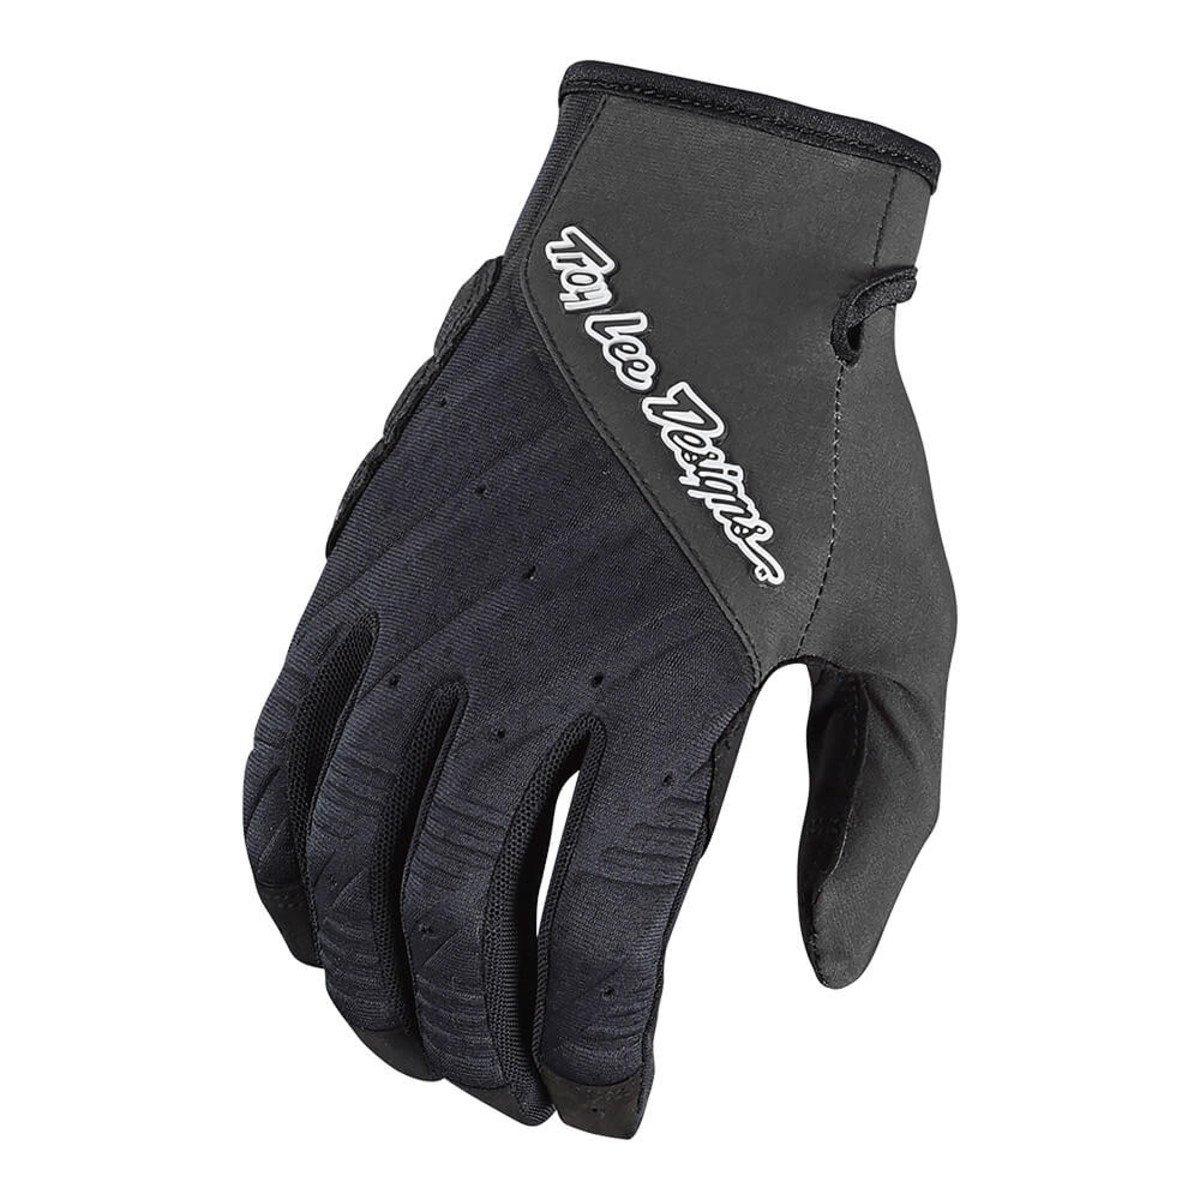 Troy Lee Designs Ruckus Glove - Men's Solid Black, M